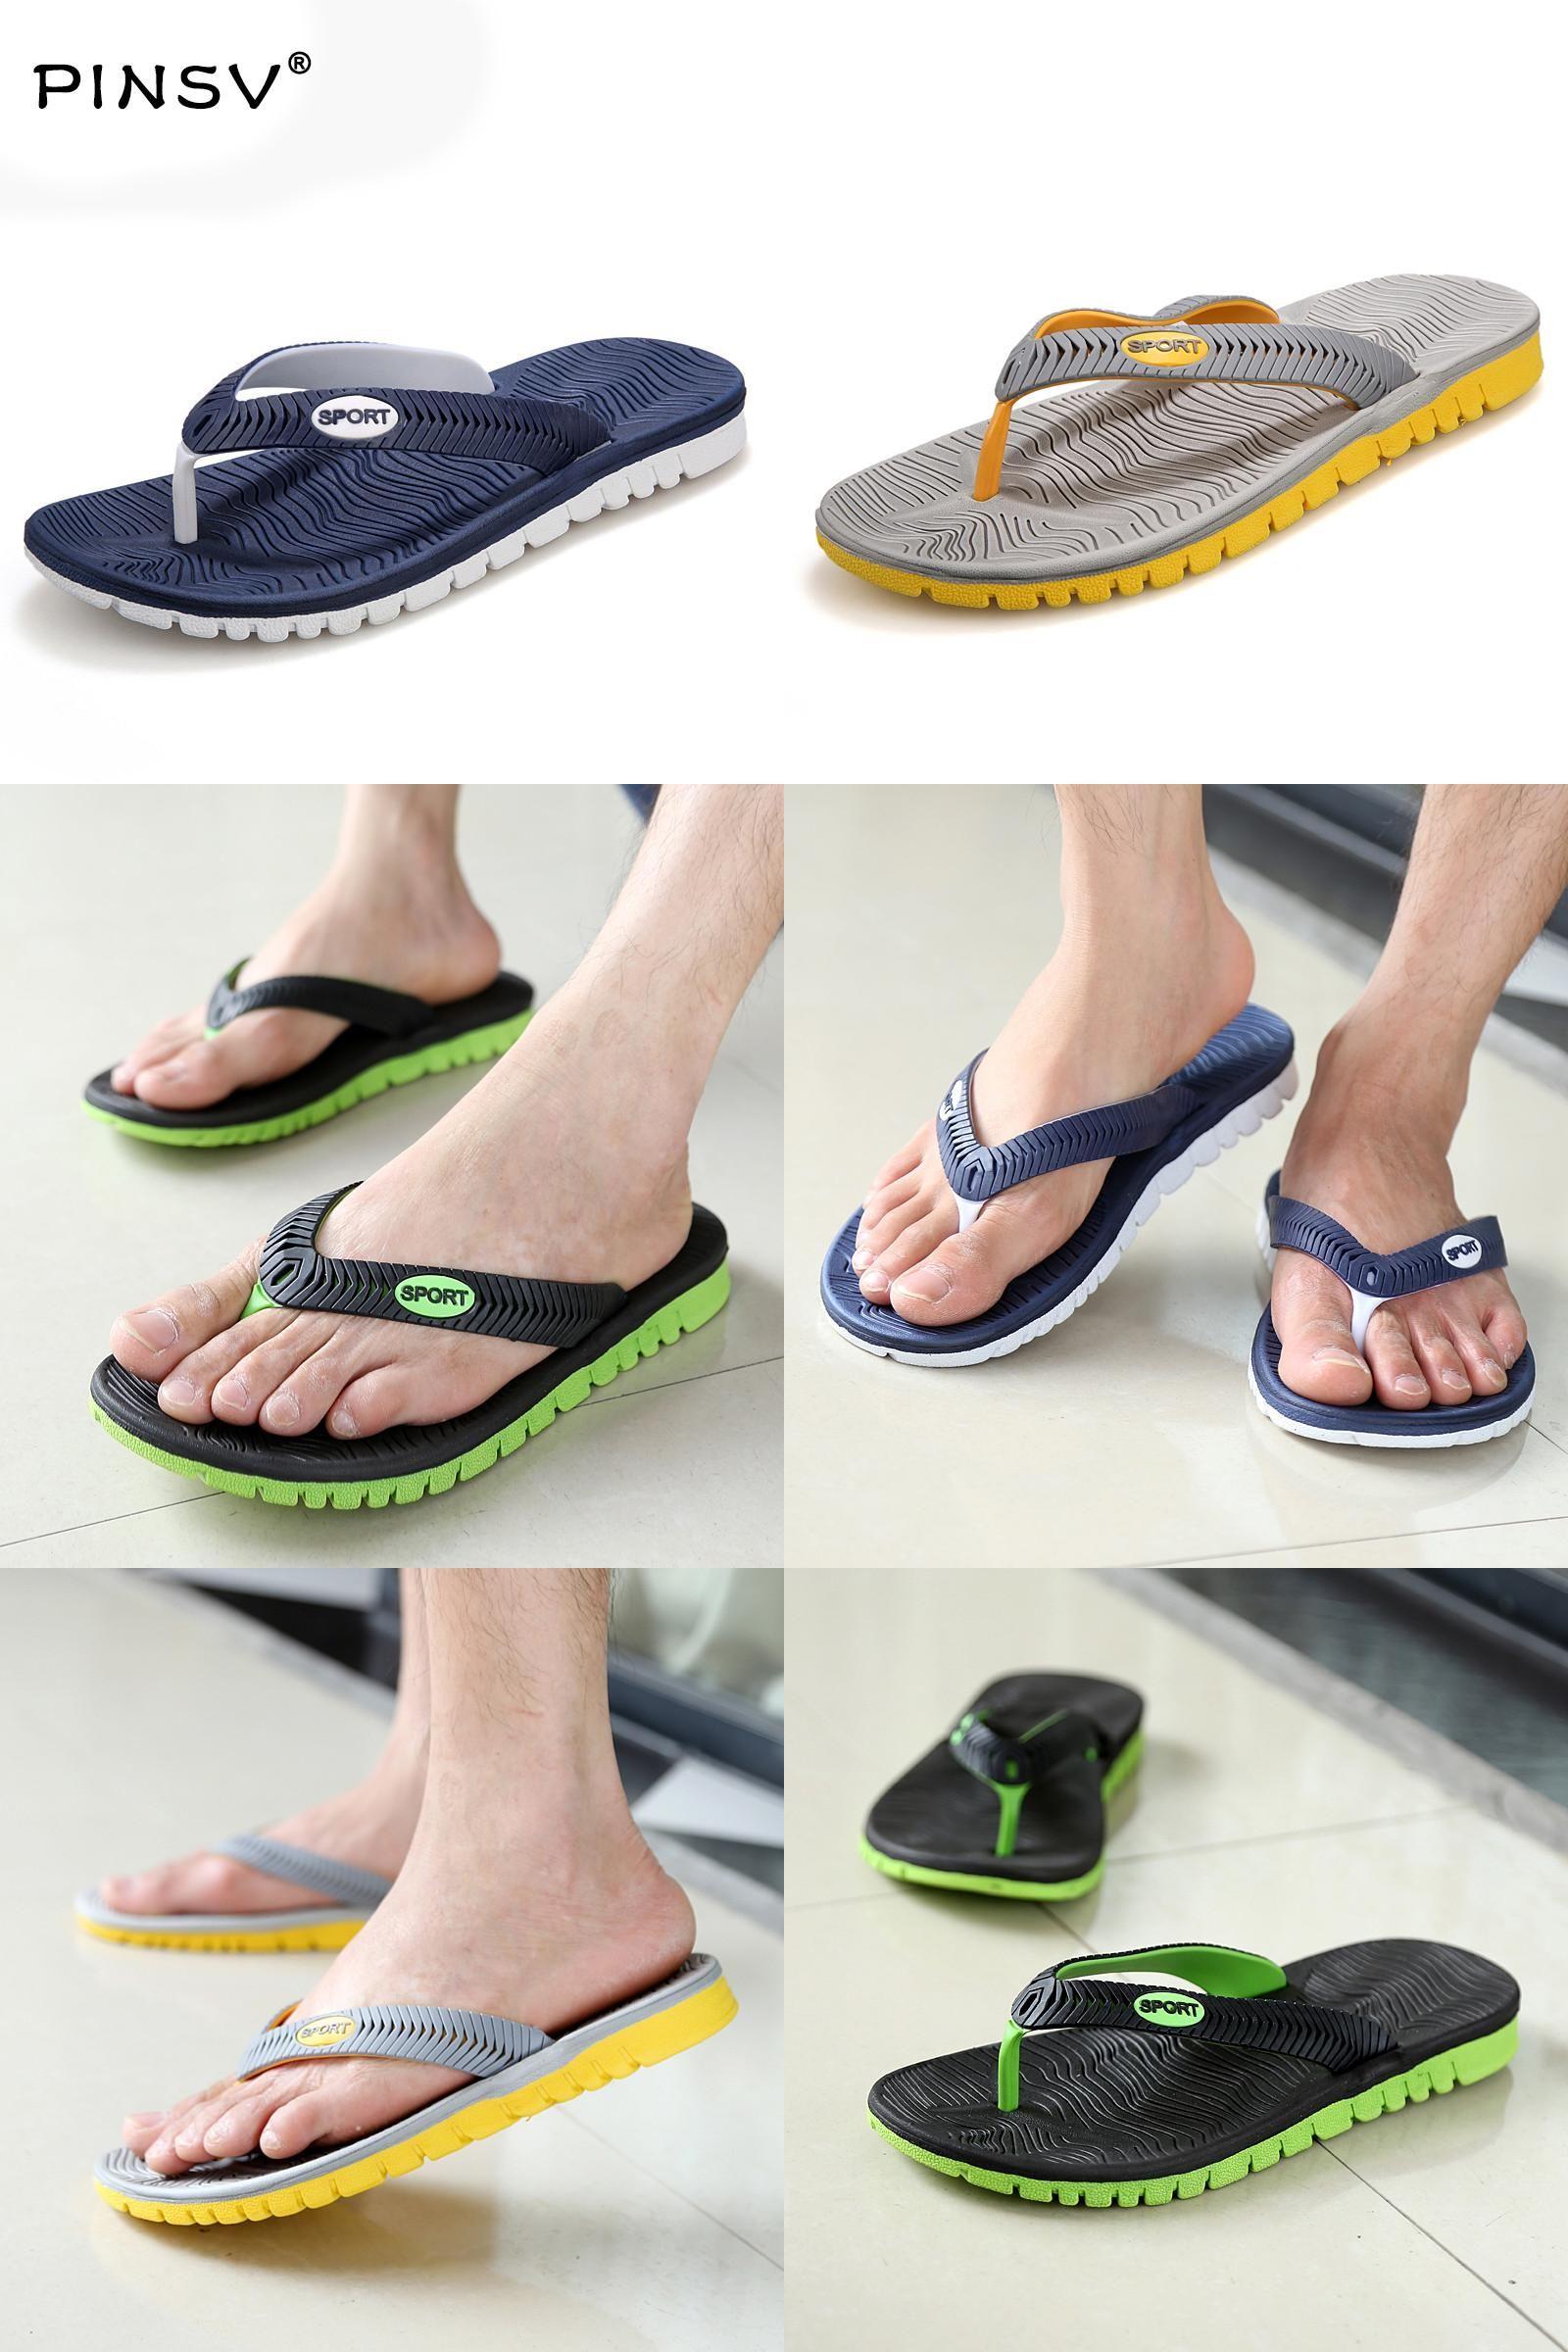 [Visit to Buy] New Summer shoes Men Flats Sandals Hot Sandalias hombre Beach Flip Flops Men's Sandals Beach Slippers Shoes For Men 40-45 #Advertisement